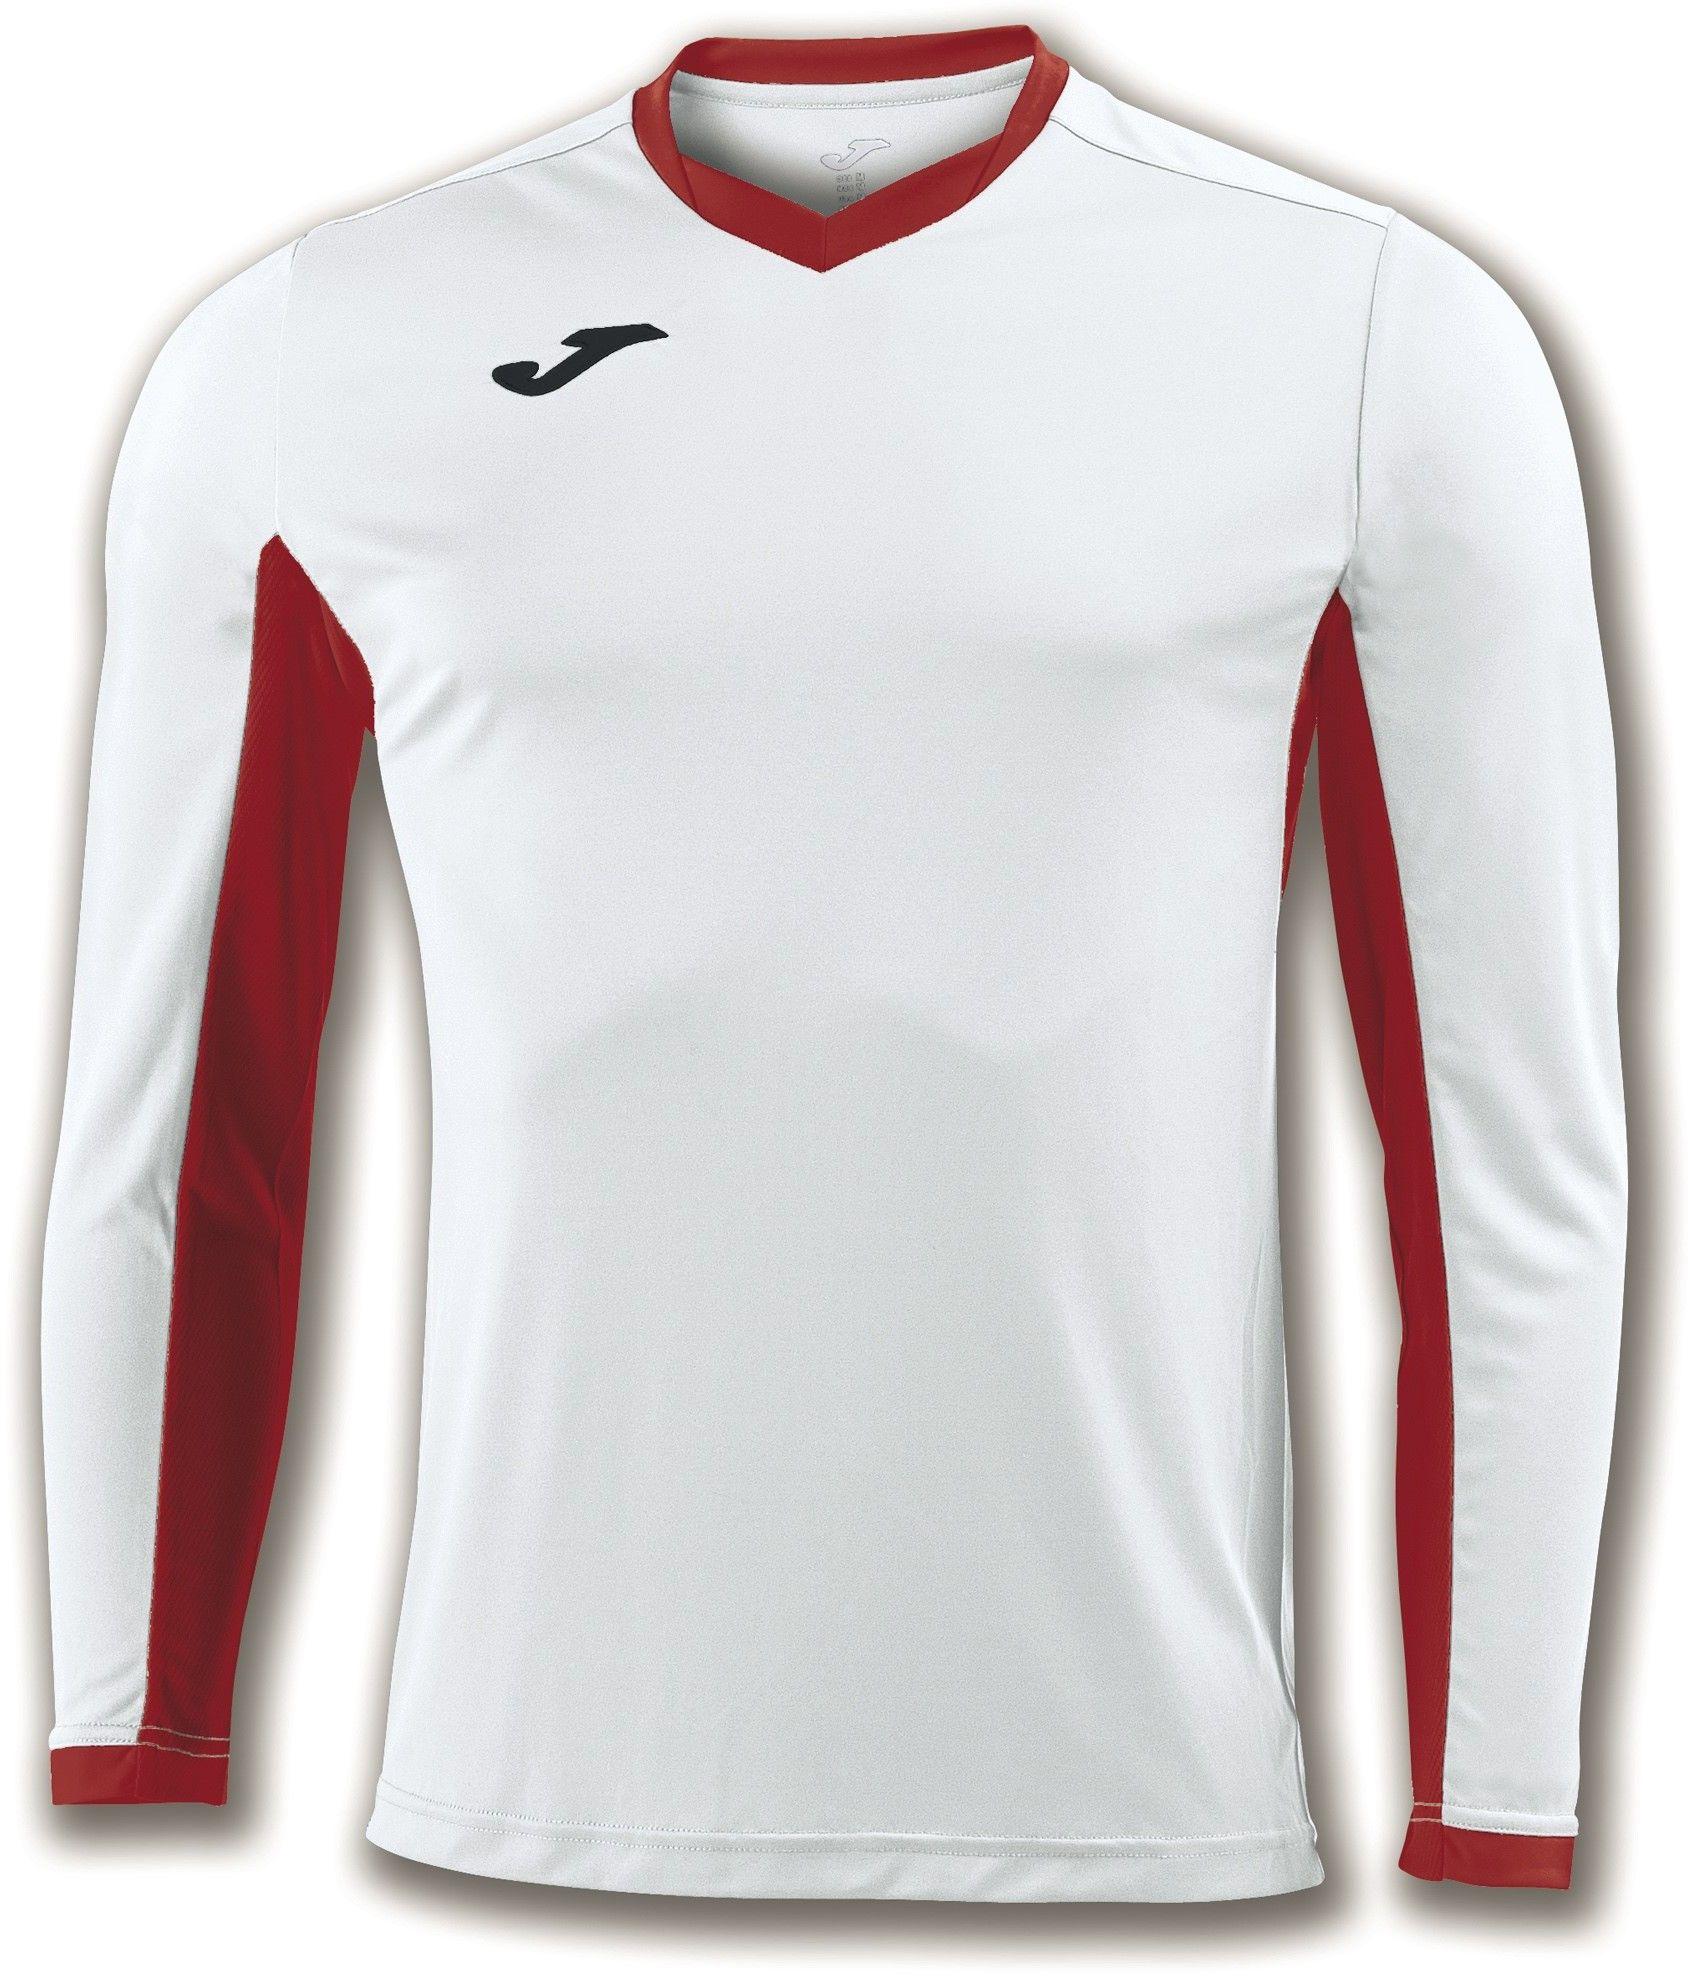 Koszulka Joma Champion IV white/red (10 szt.)